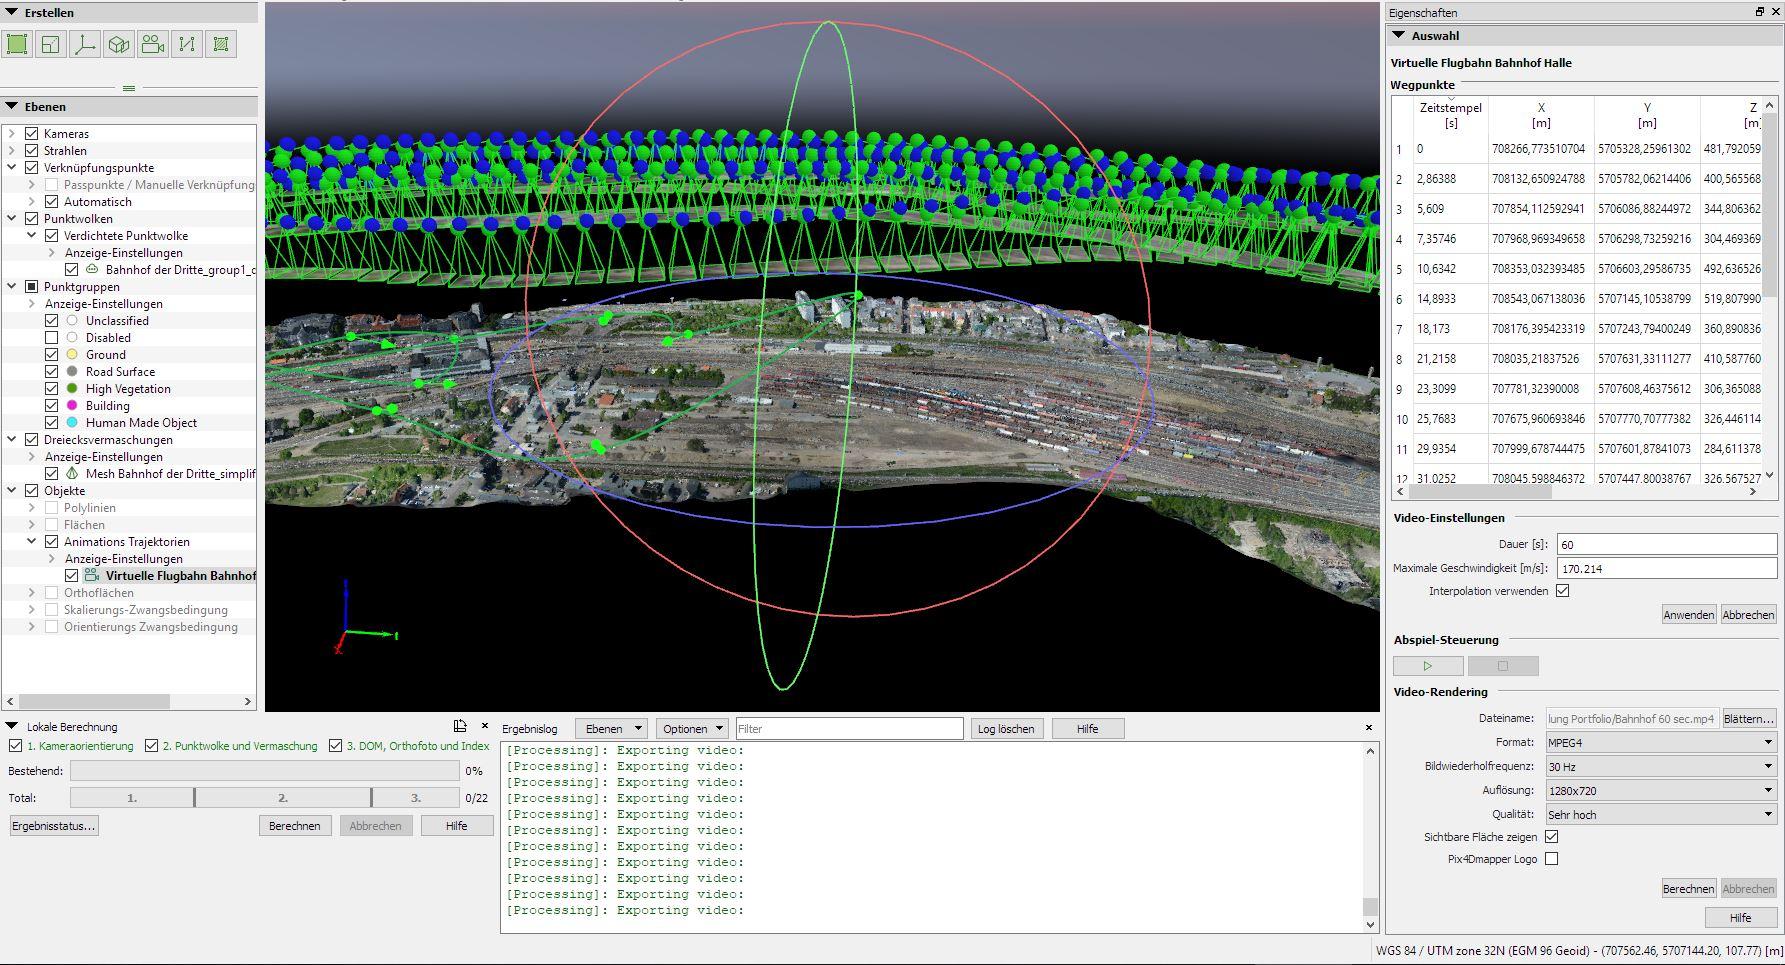 Virtuelle Flugbahn erstellen